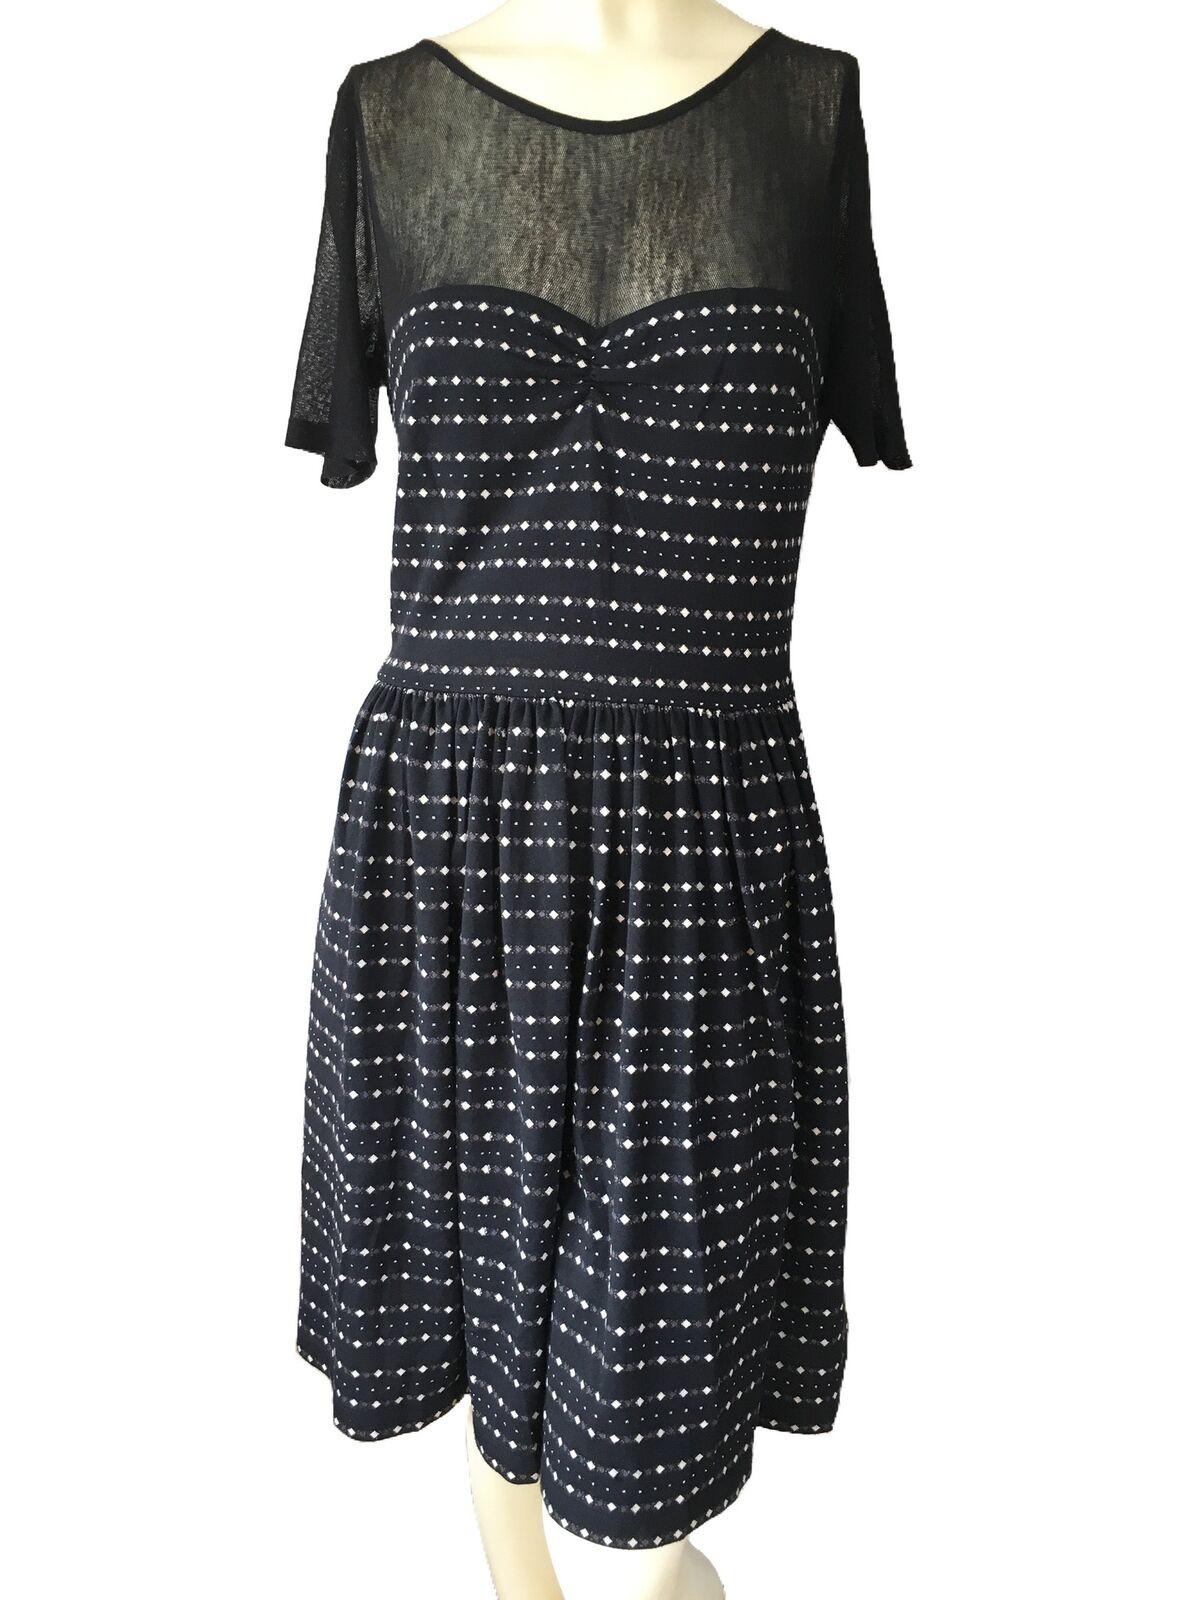 Betsey Johnson Mesh Bodice V-Neck Back Fit & Flare Metallic Print Dress Sz 4 12